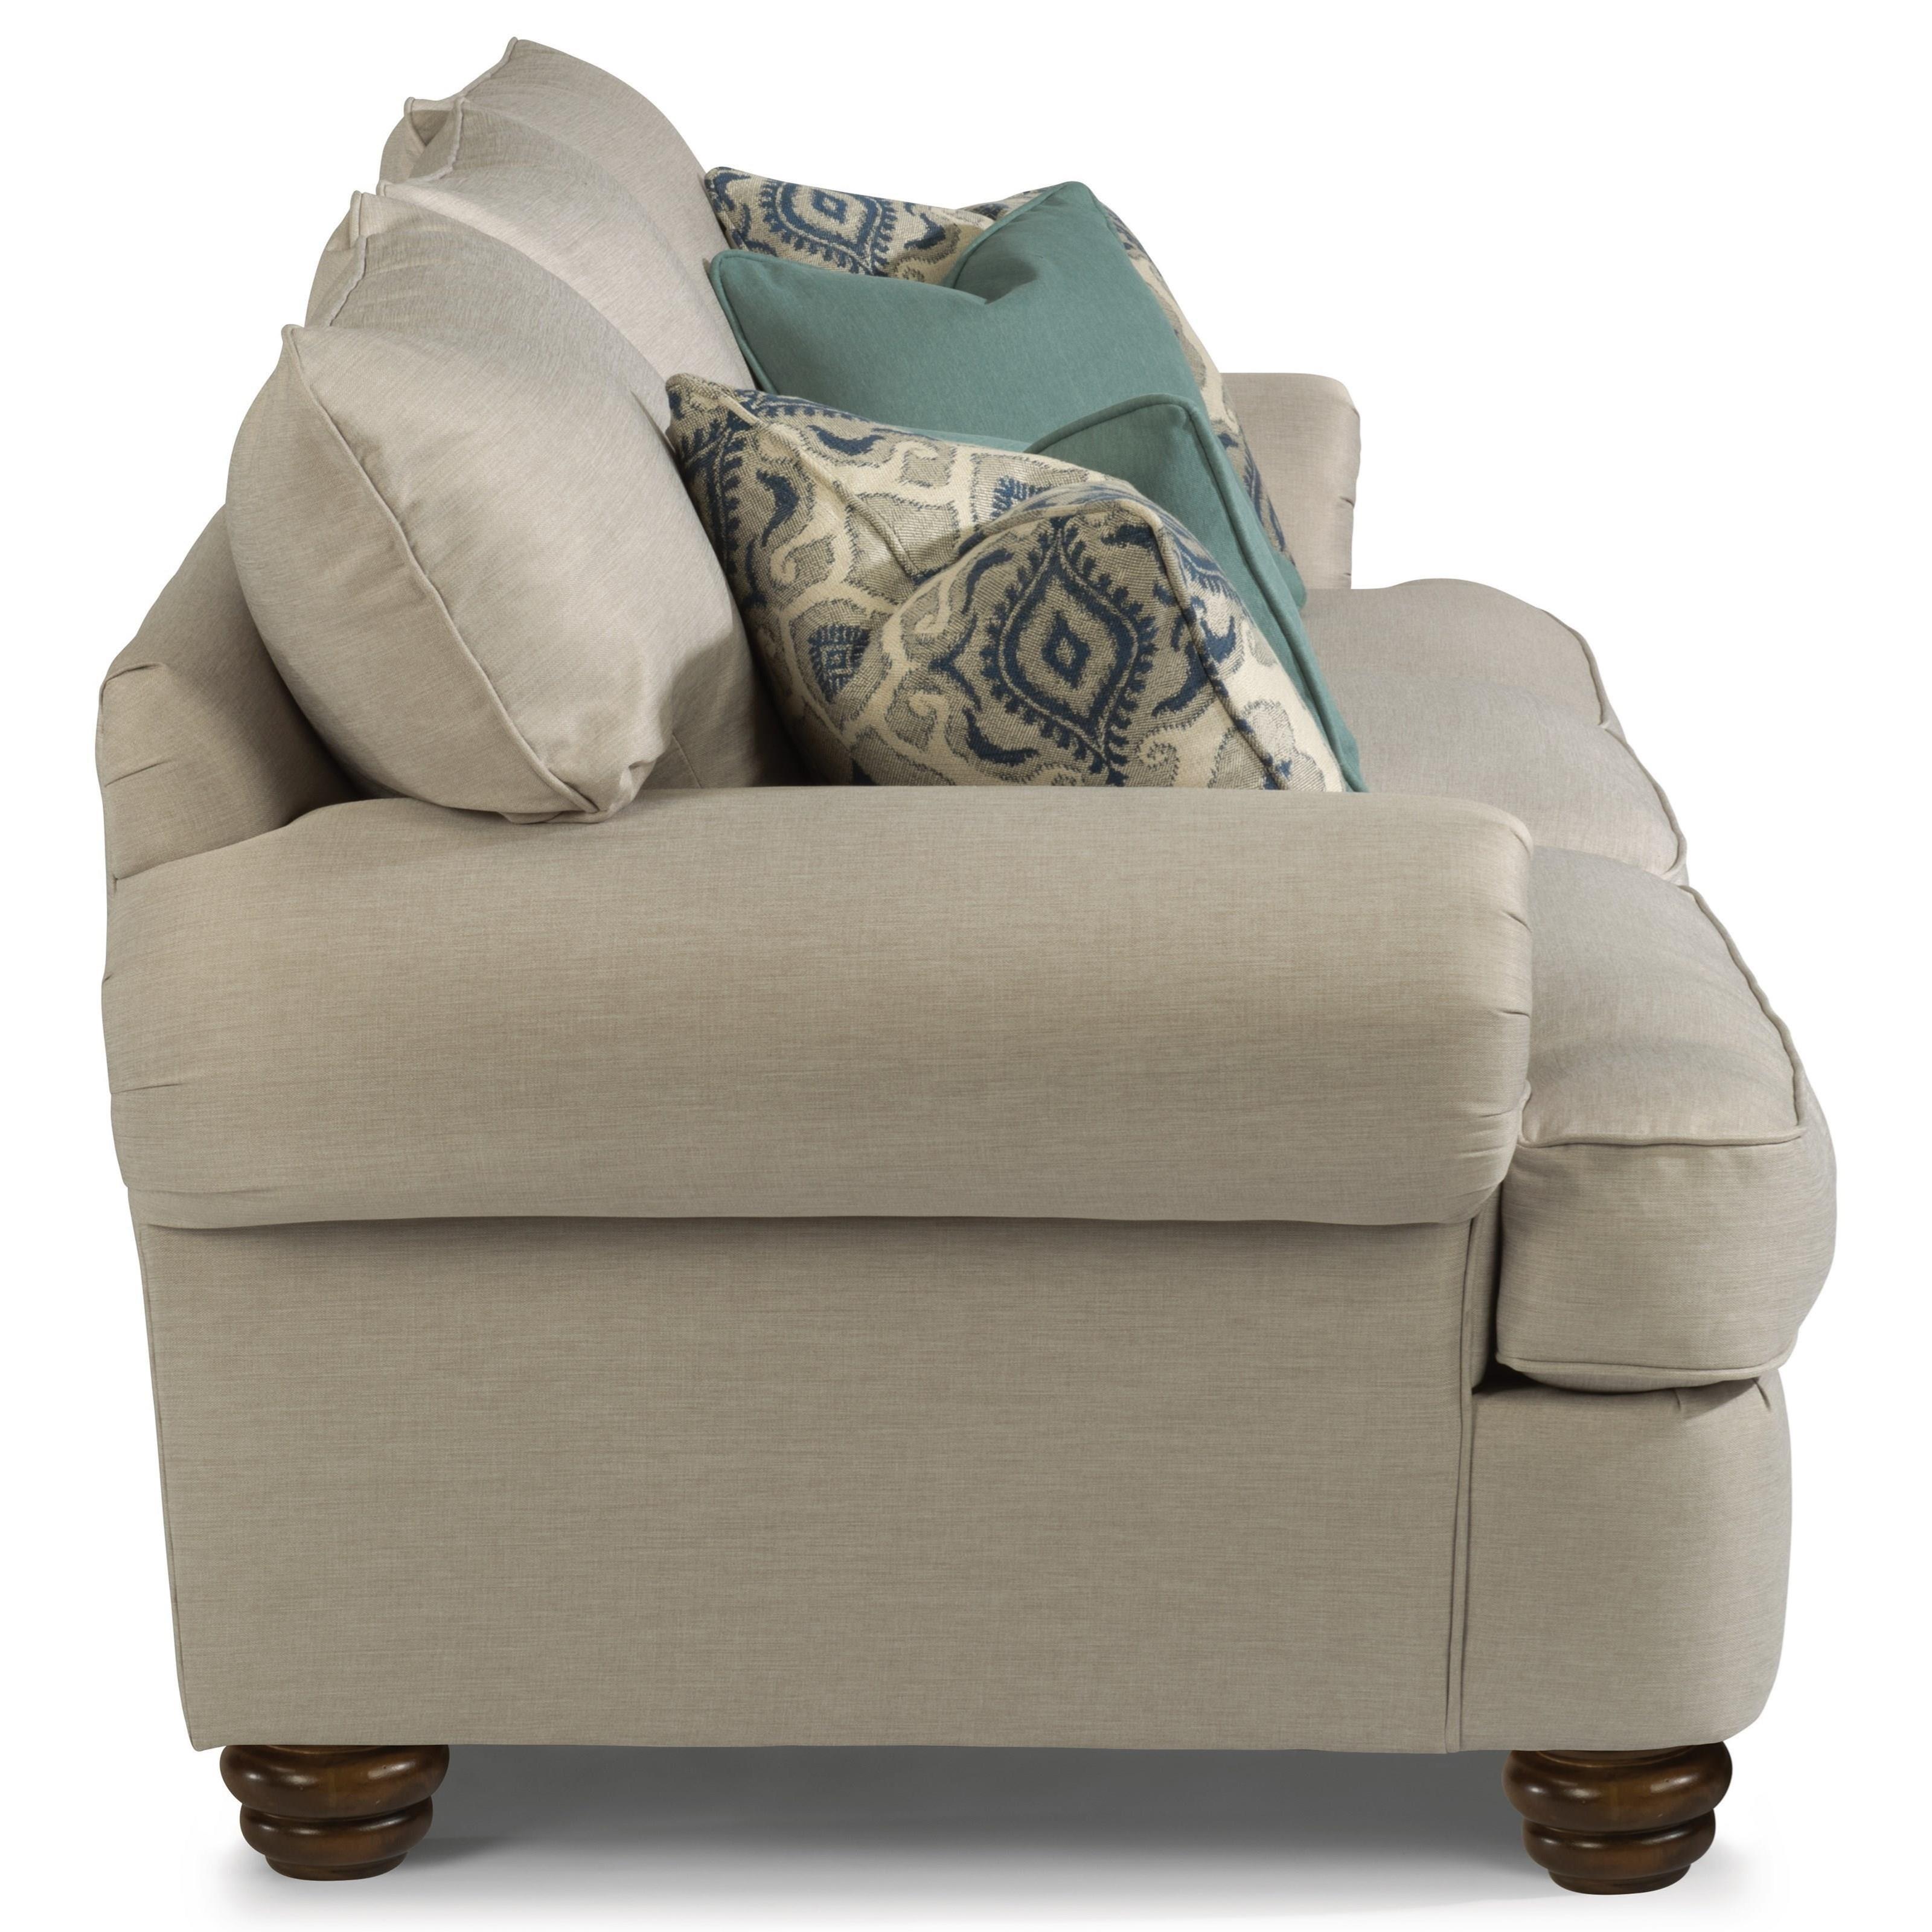 Flexsteel Sofa Bed Mattress: Flexsteel Providence Traditional Sofa With Bun Feet